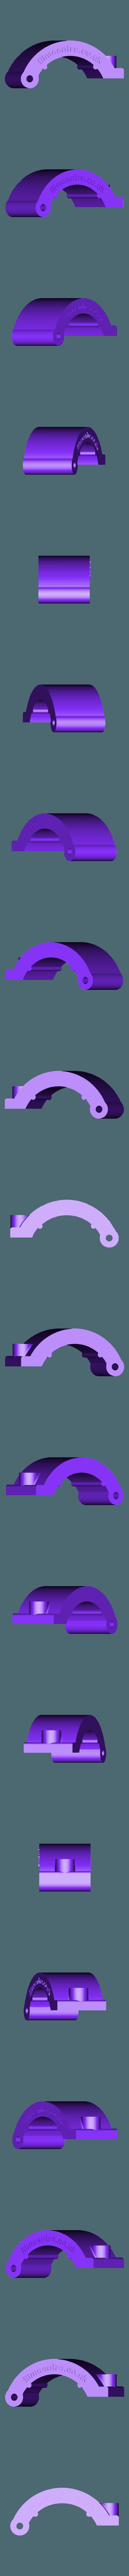 sinar tripod mount (v1.7txt) clamp.stl Download STL file Sinar rail clamp (camera/tripod support) & F1 repairs • 3D printing object, vintage-lens